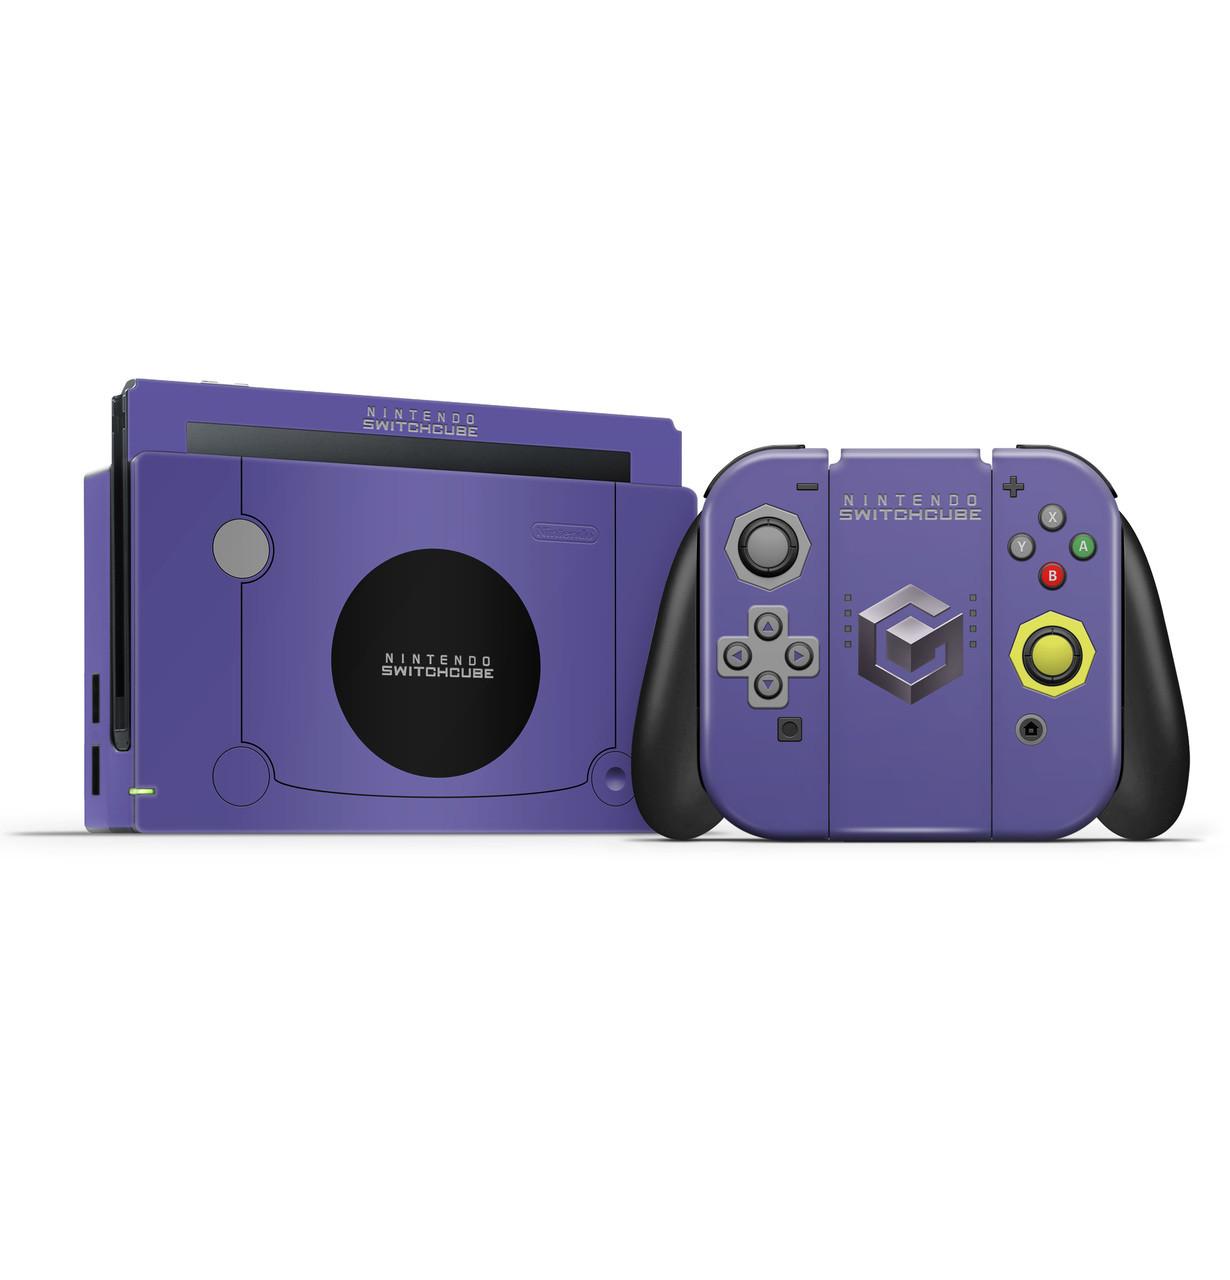 Gamecube Switch Skin